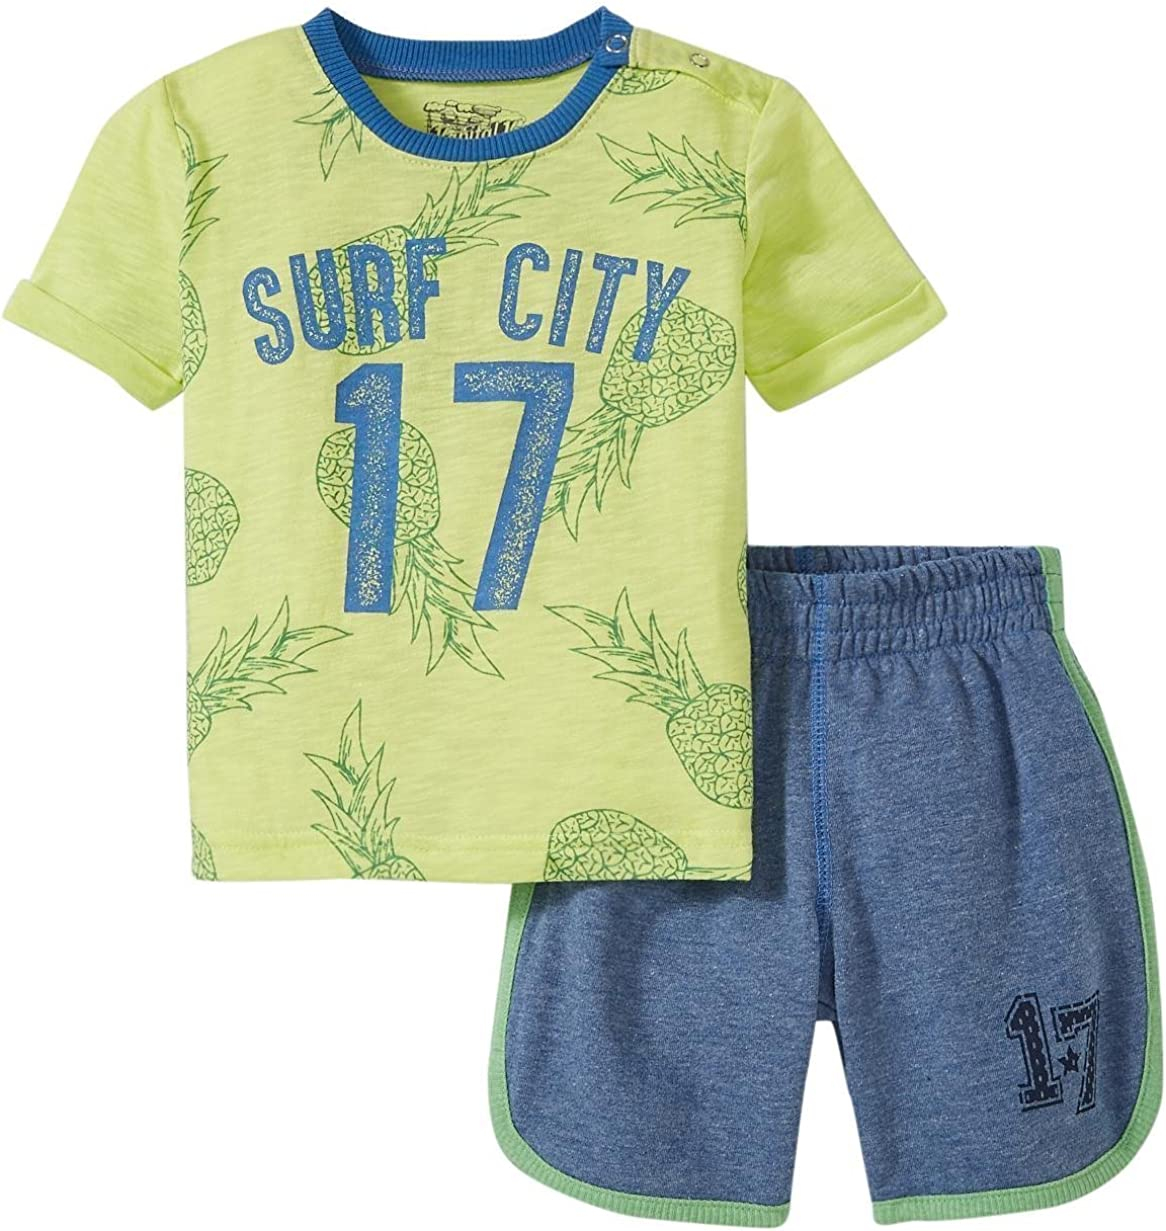 Kapital K baby-boys Surf City Graphic Tee/Pull-on Short Set Toddler